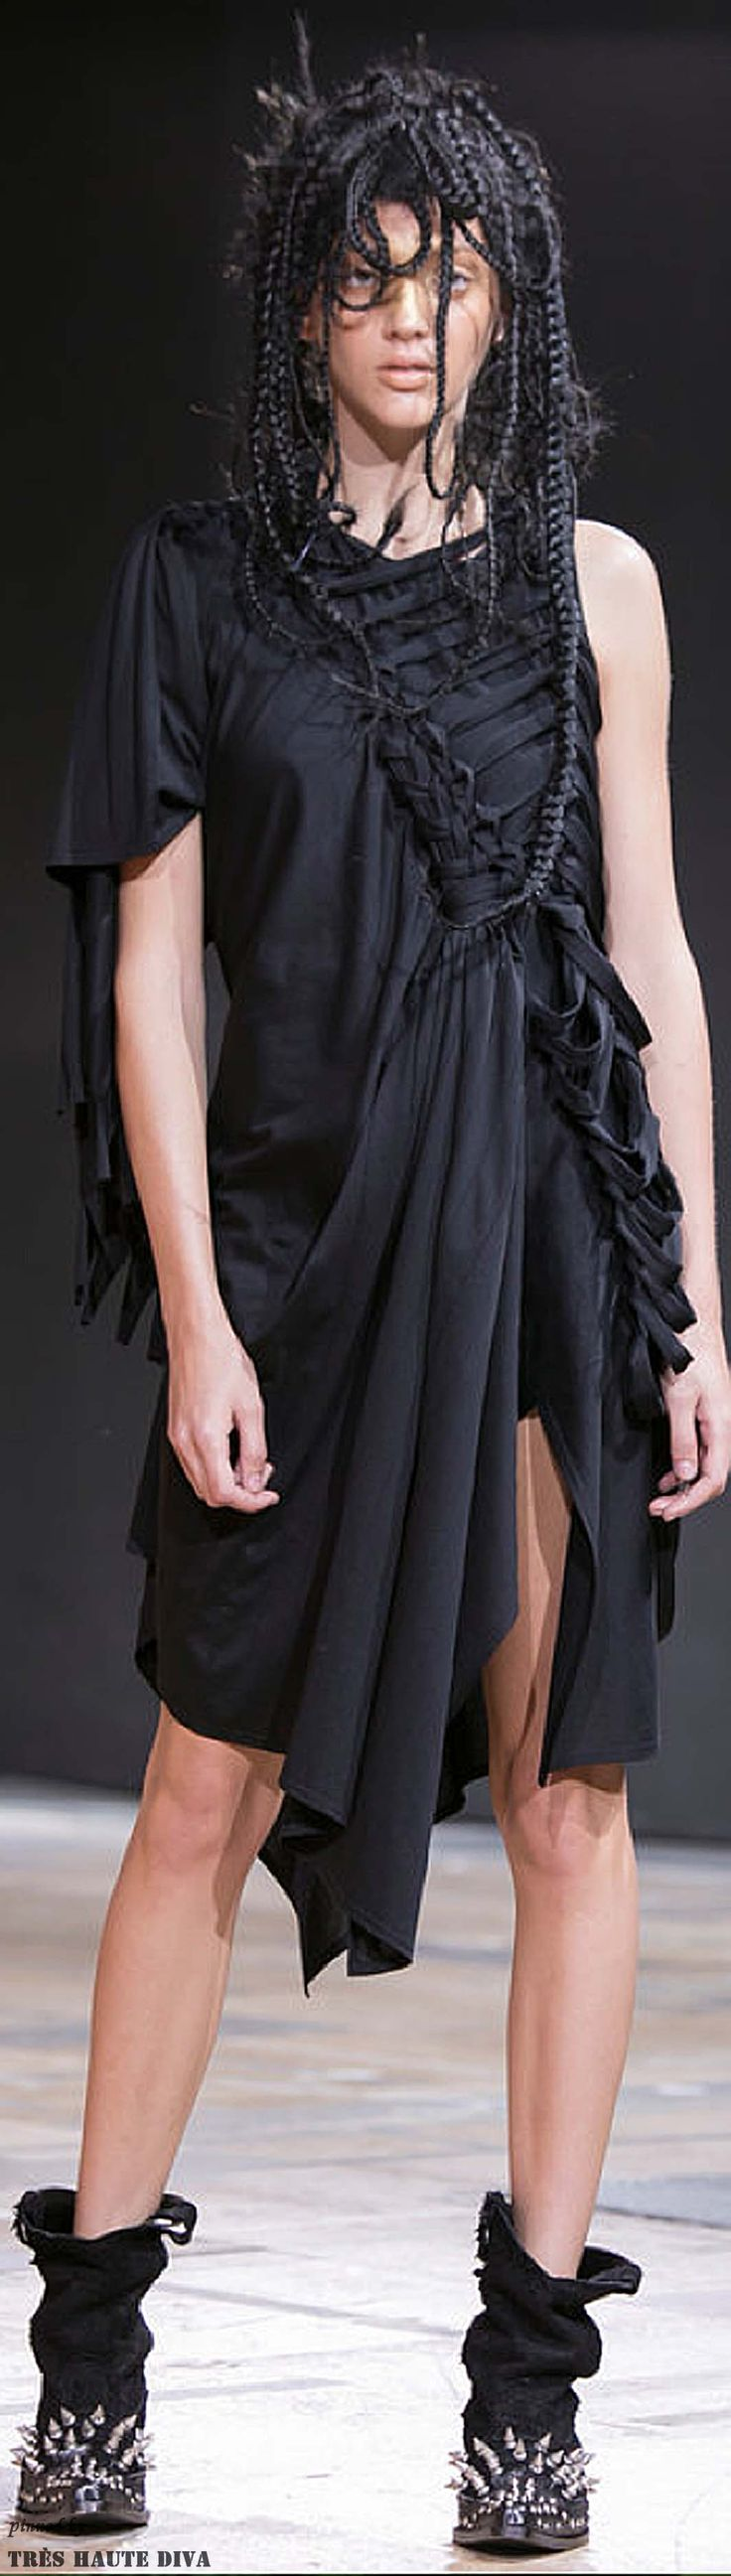 Paris FW Junya Watanabe Spring / Summer 2014 RTW The fabric manipulation...not the hair!